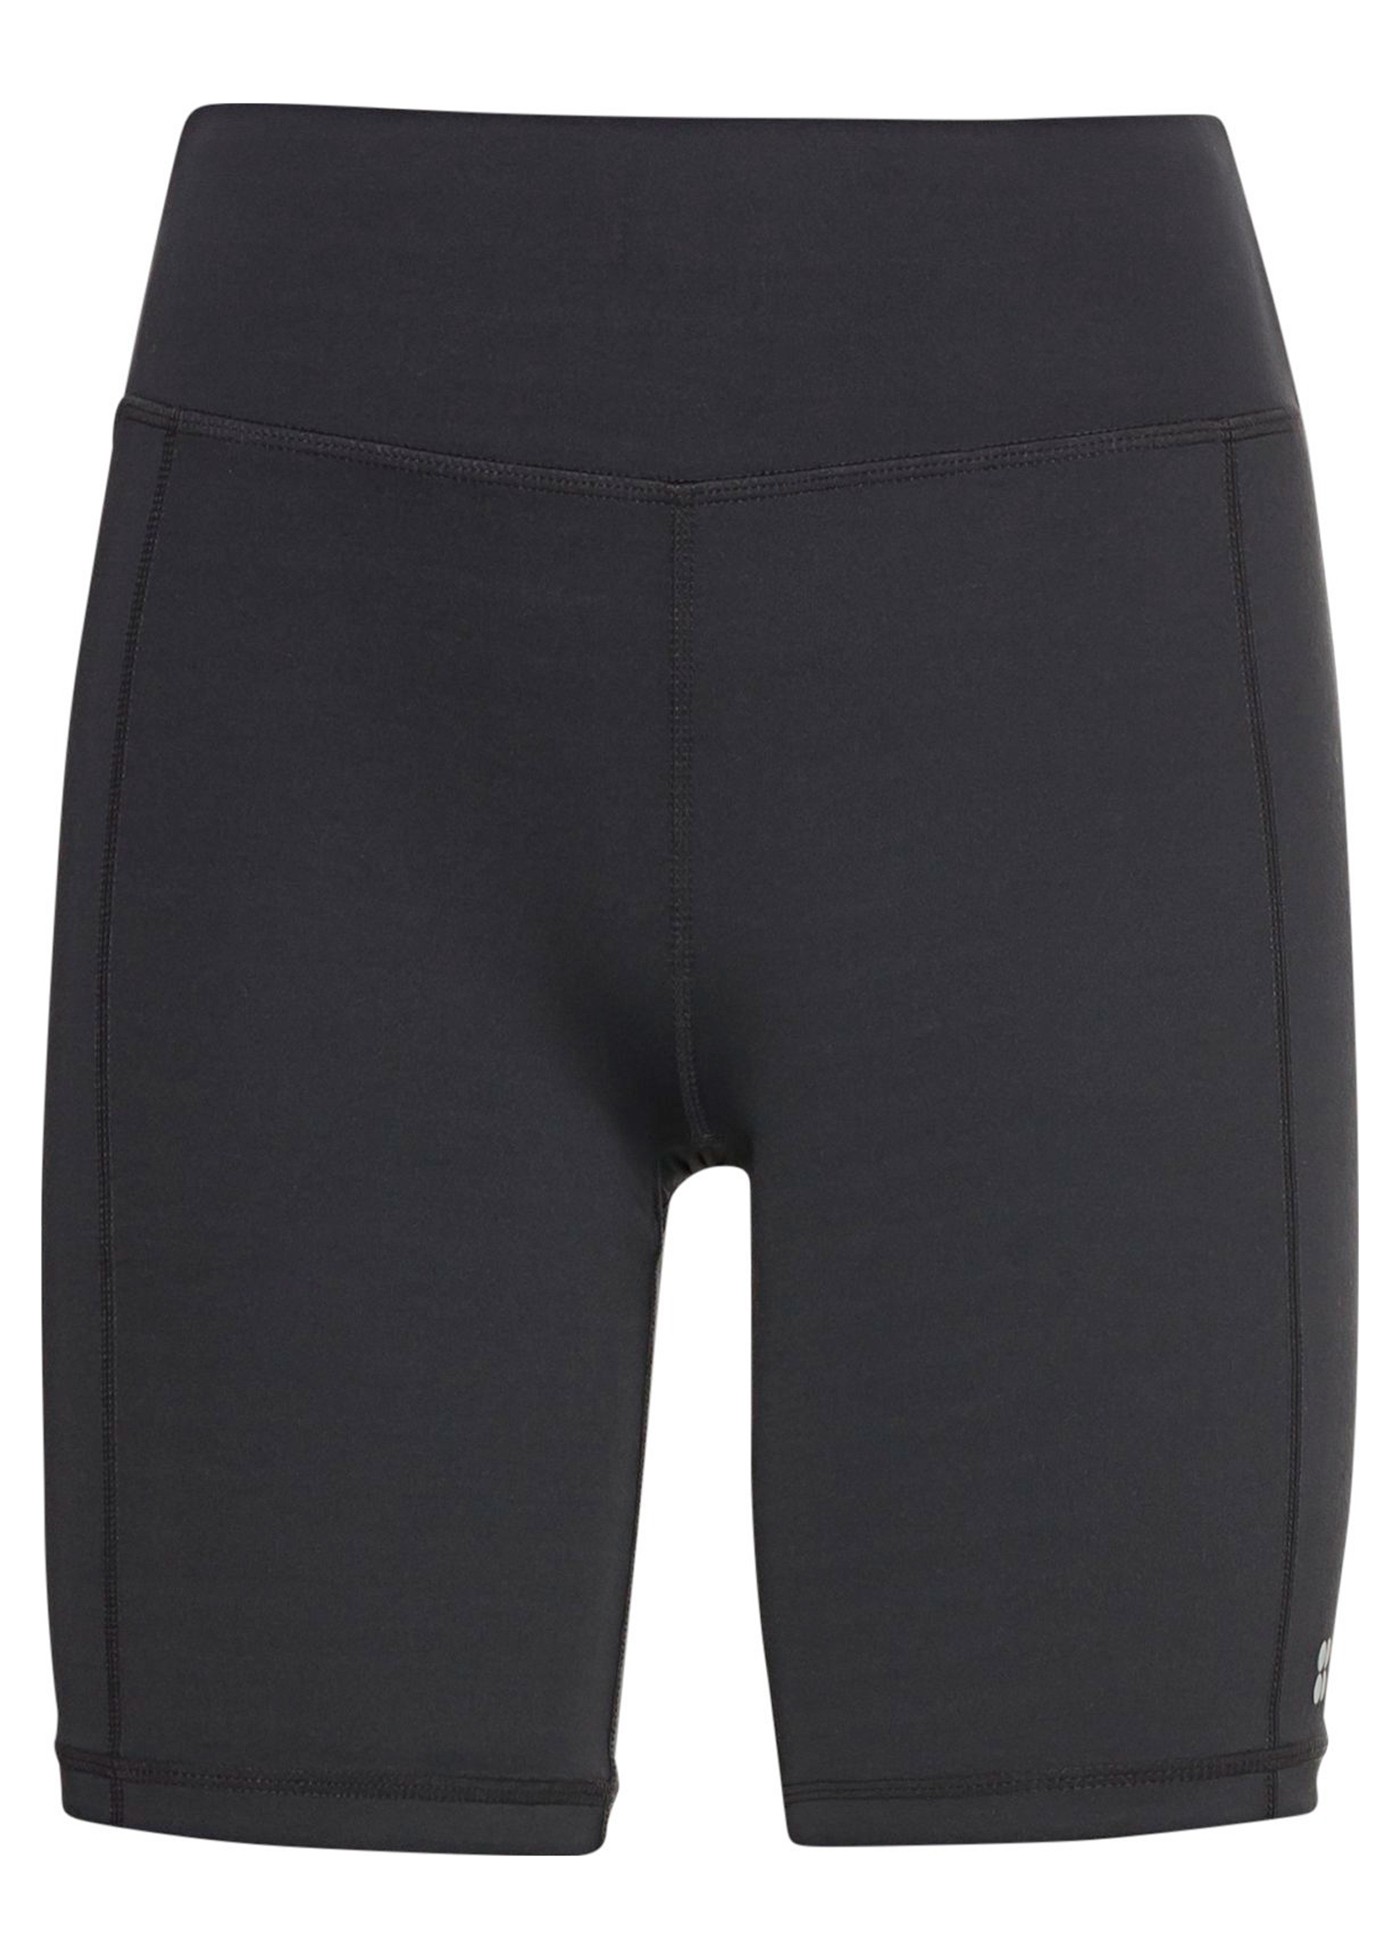 "All Day 9"" Biker Shorts image number 0"